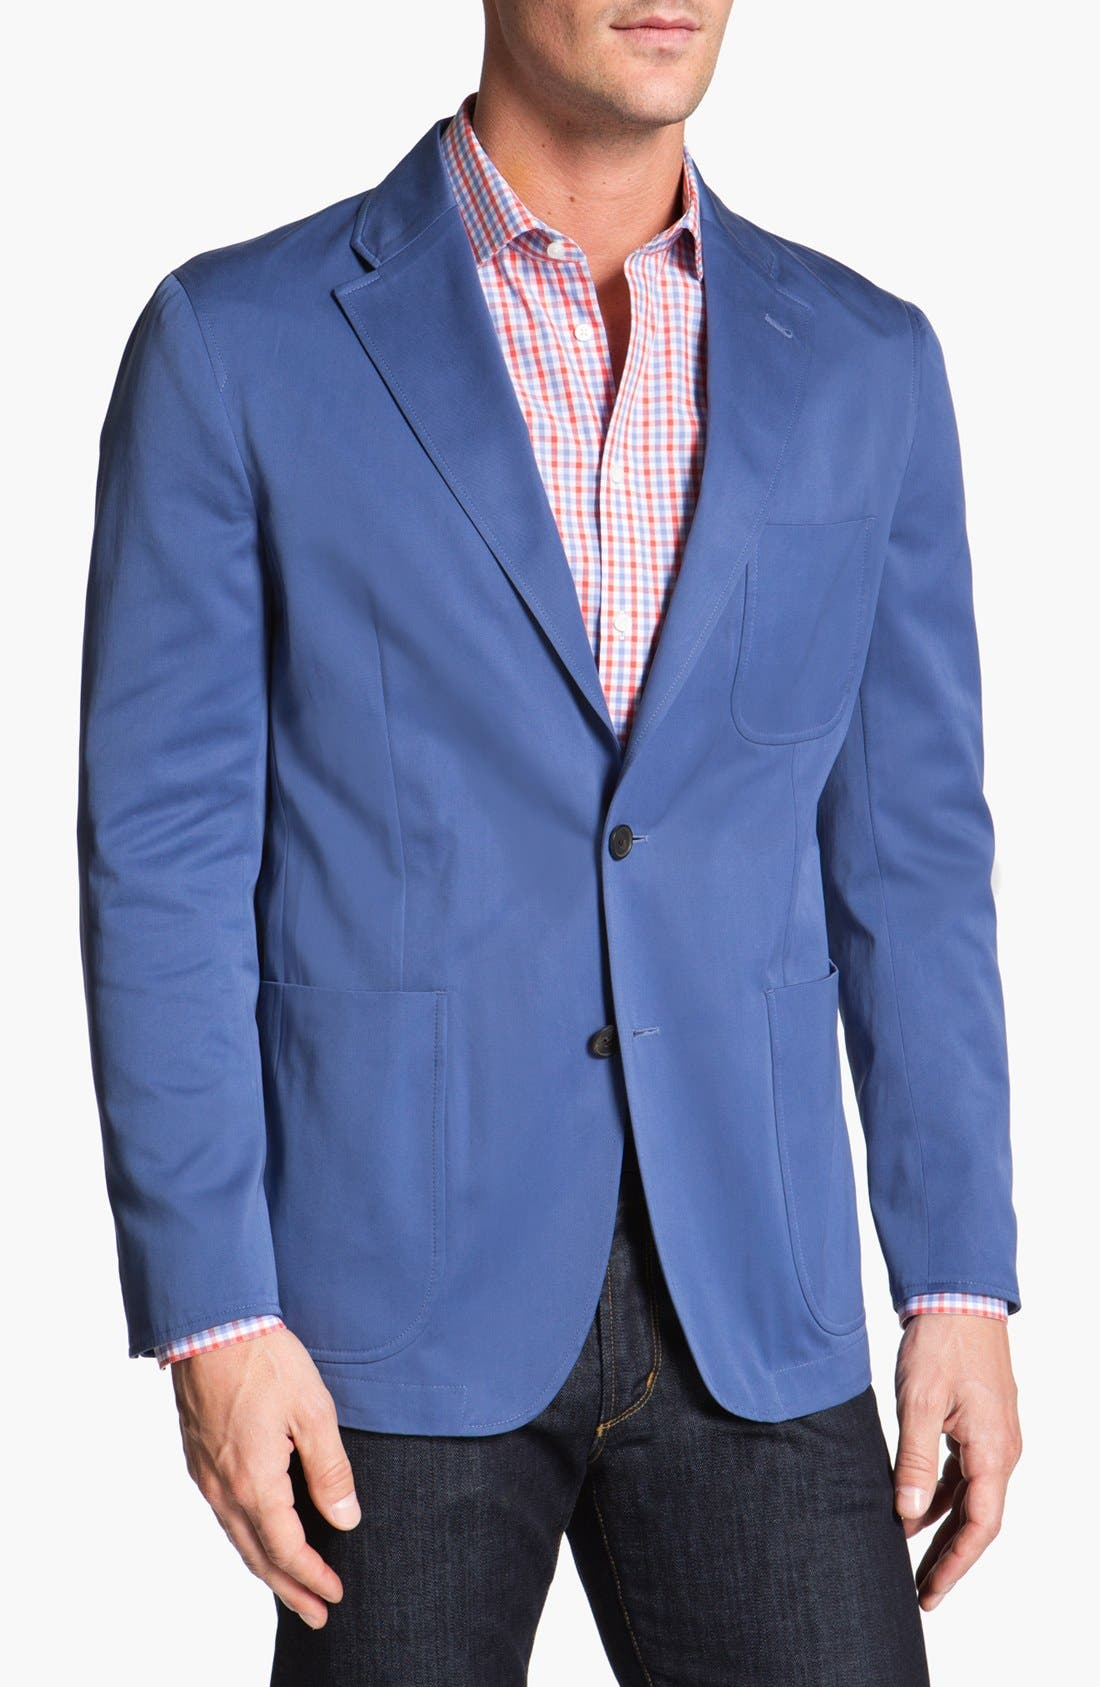 Alternate Image 1 Selected - Joseph Abboud Trim Fit Cotton Blazer